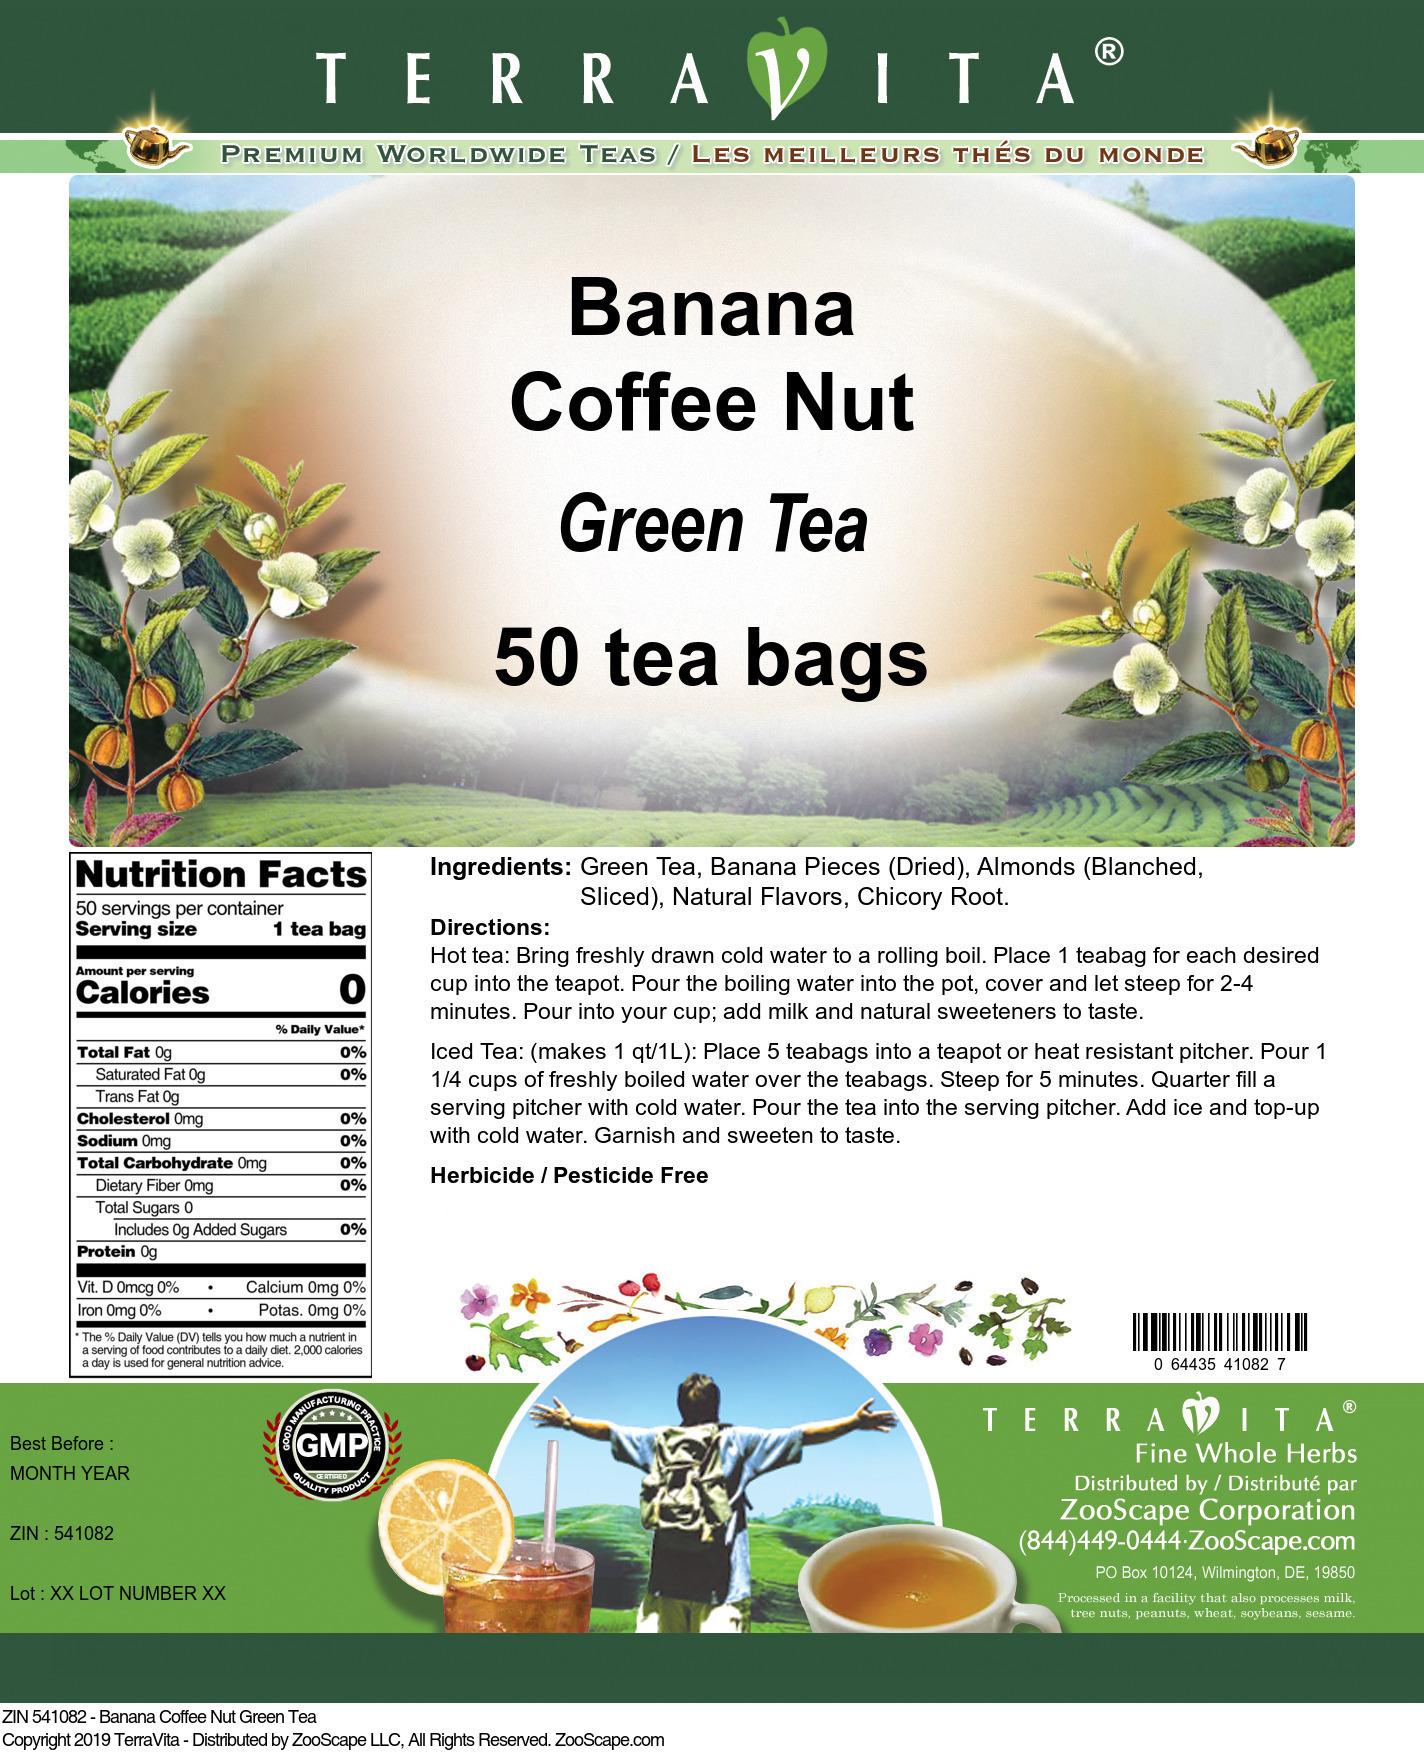 Banana Coffee Nut Green Tea